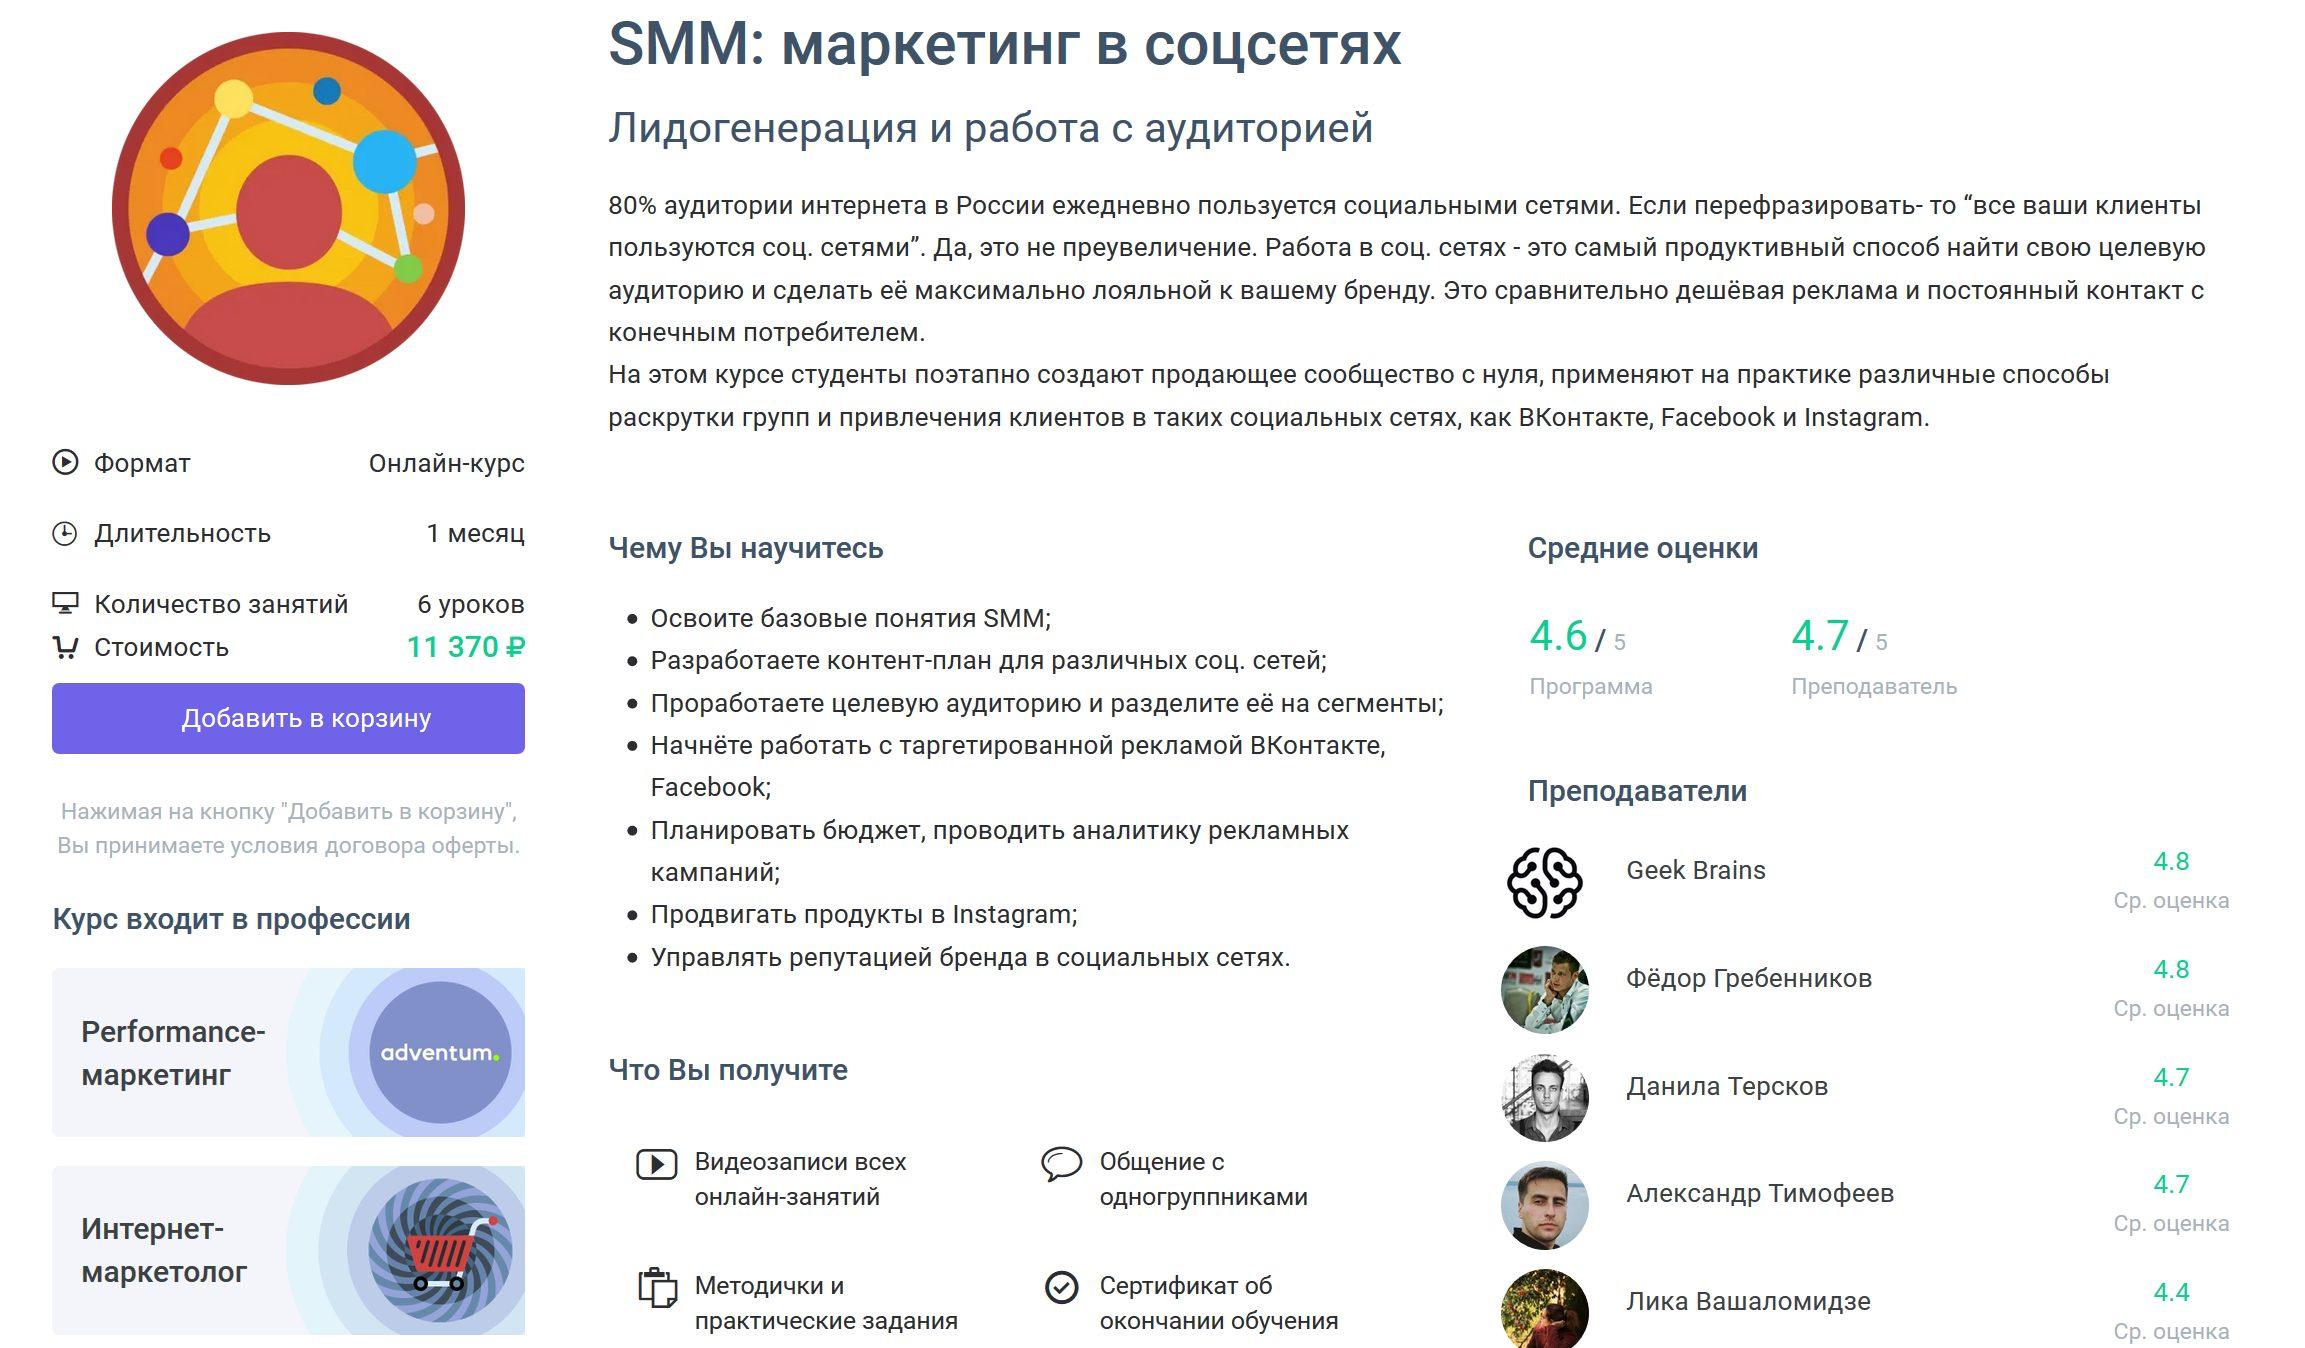 SMM: маркетинг в соцсетях от GeekBrains